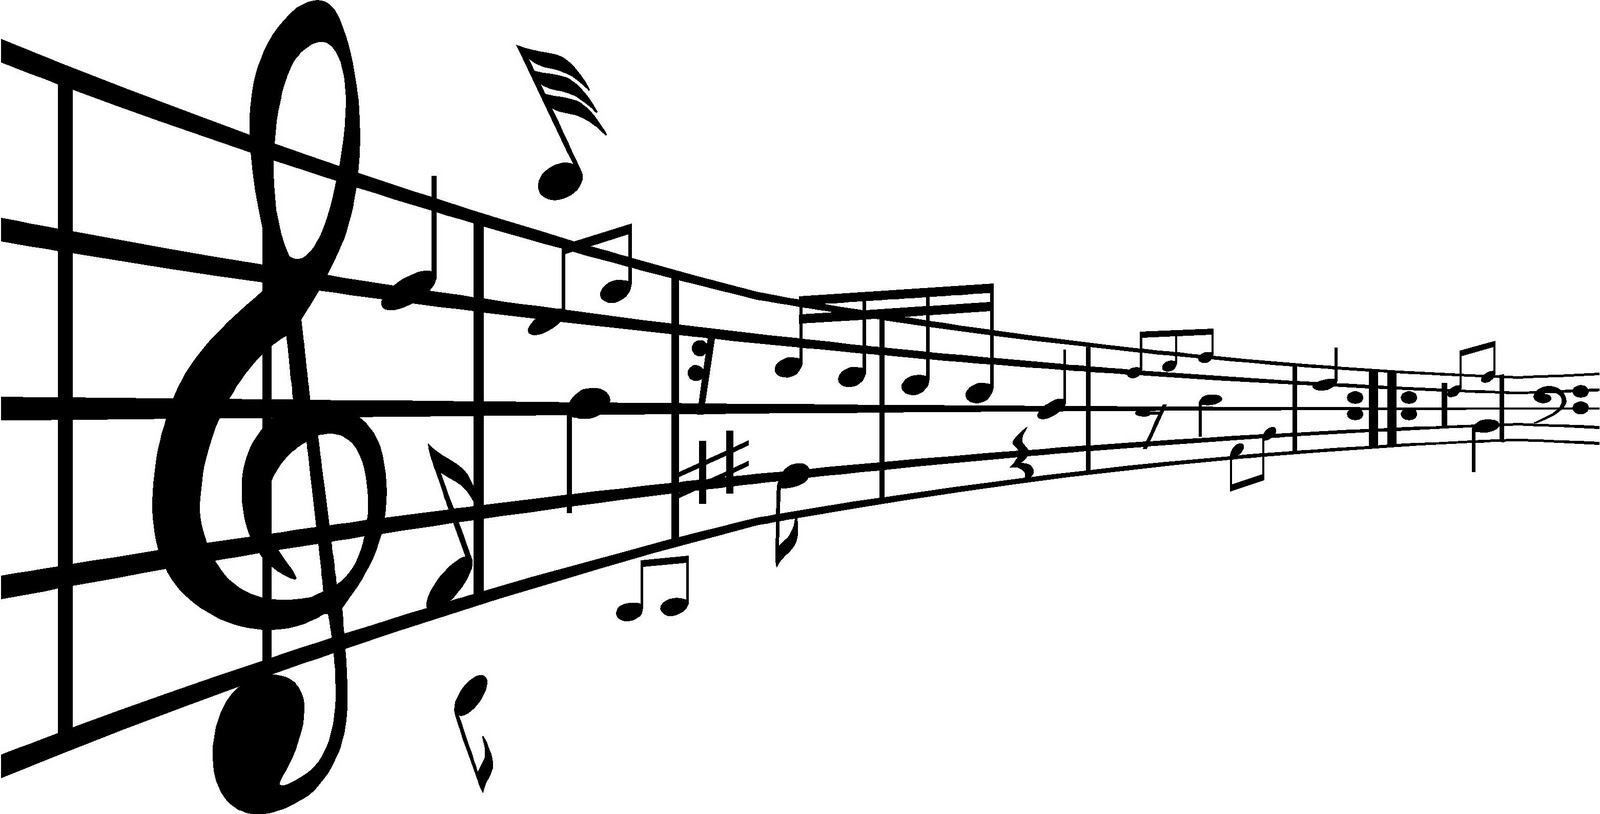 Notas musicales convertidas en palabras